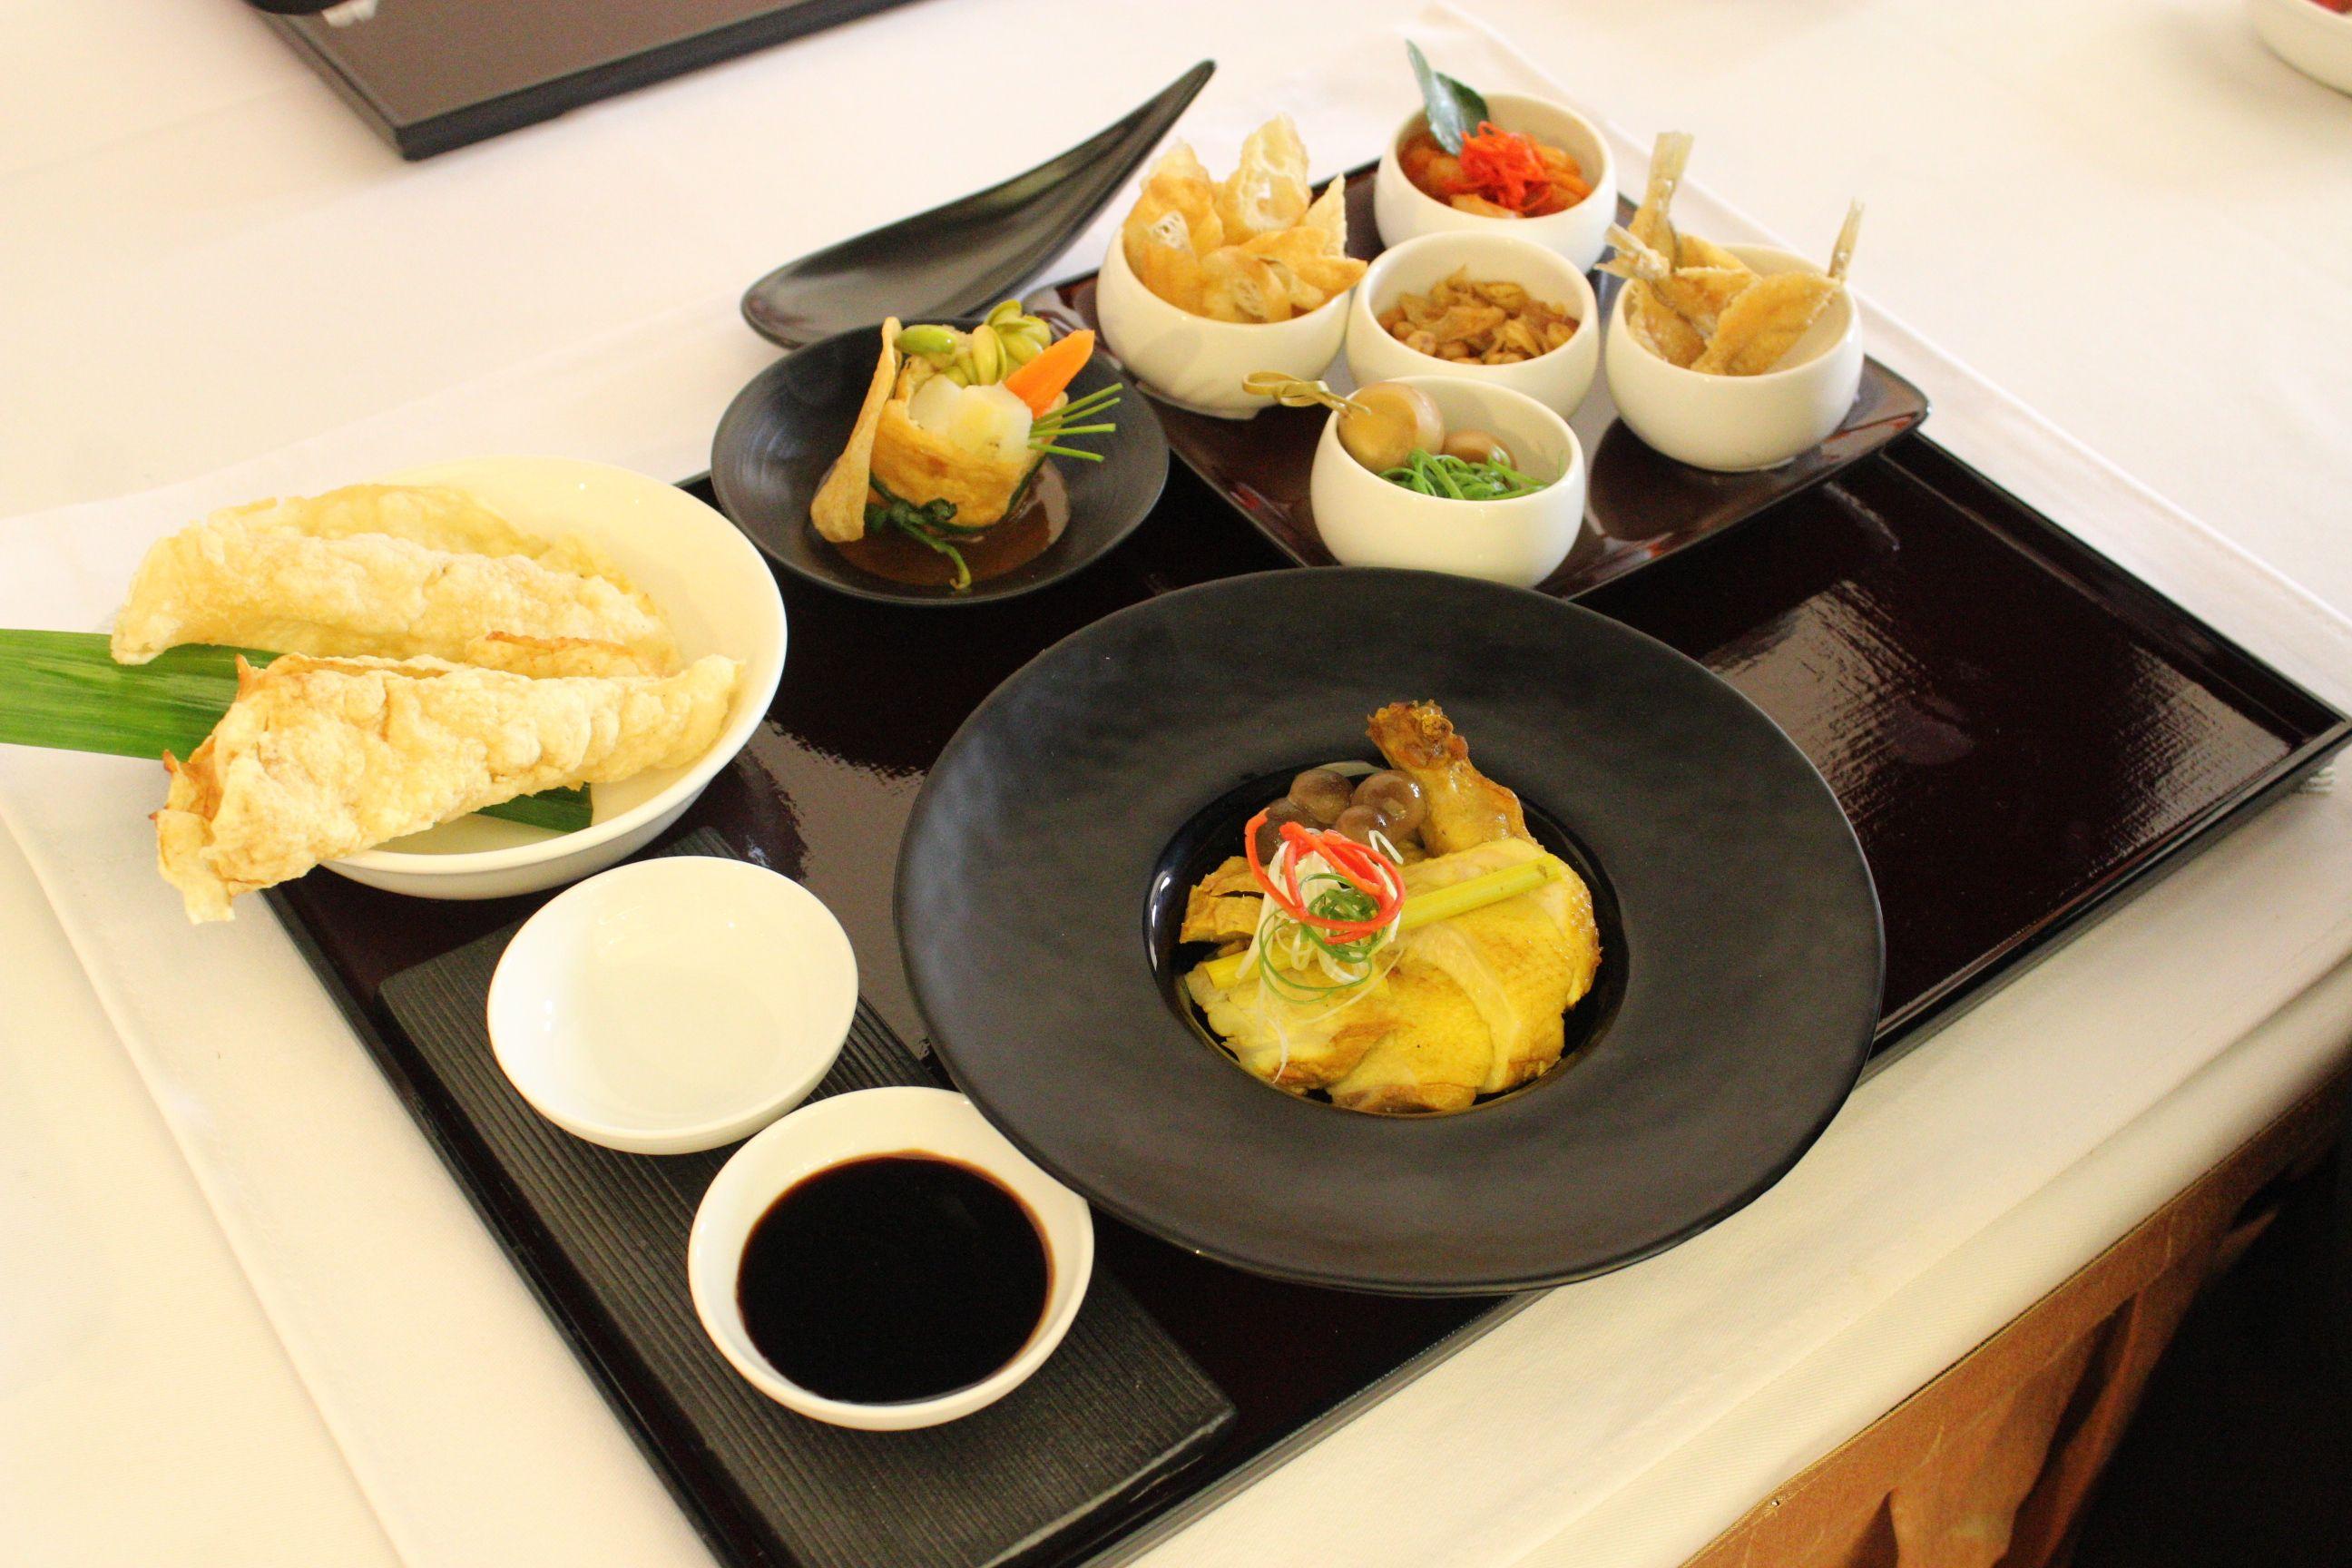 Indonesian breakfast tray